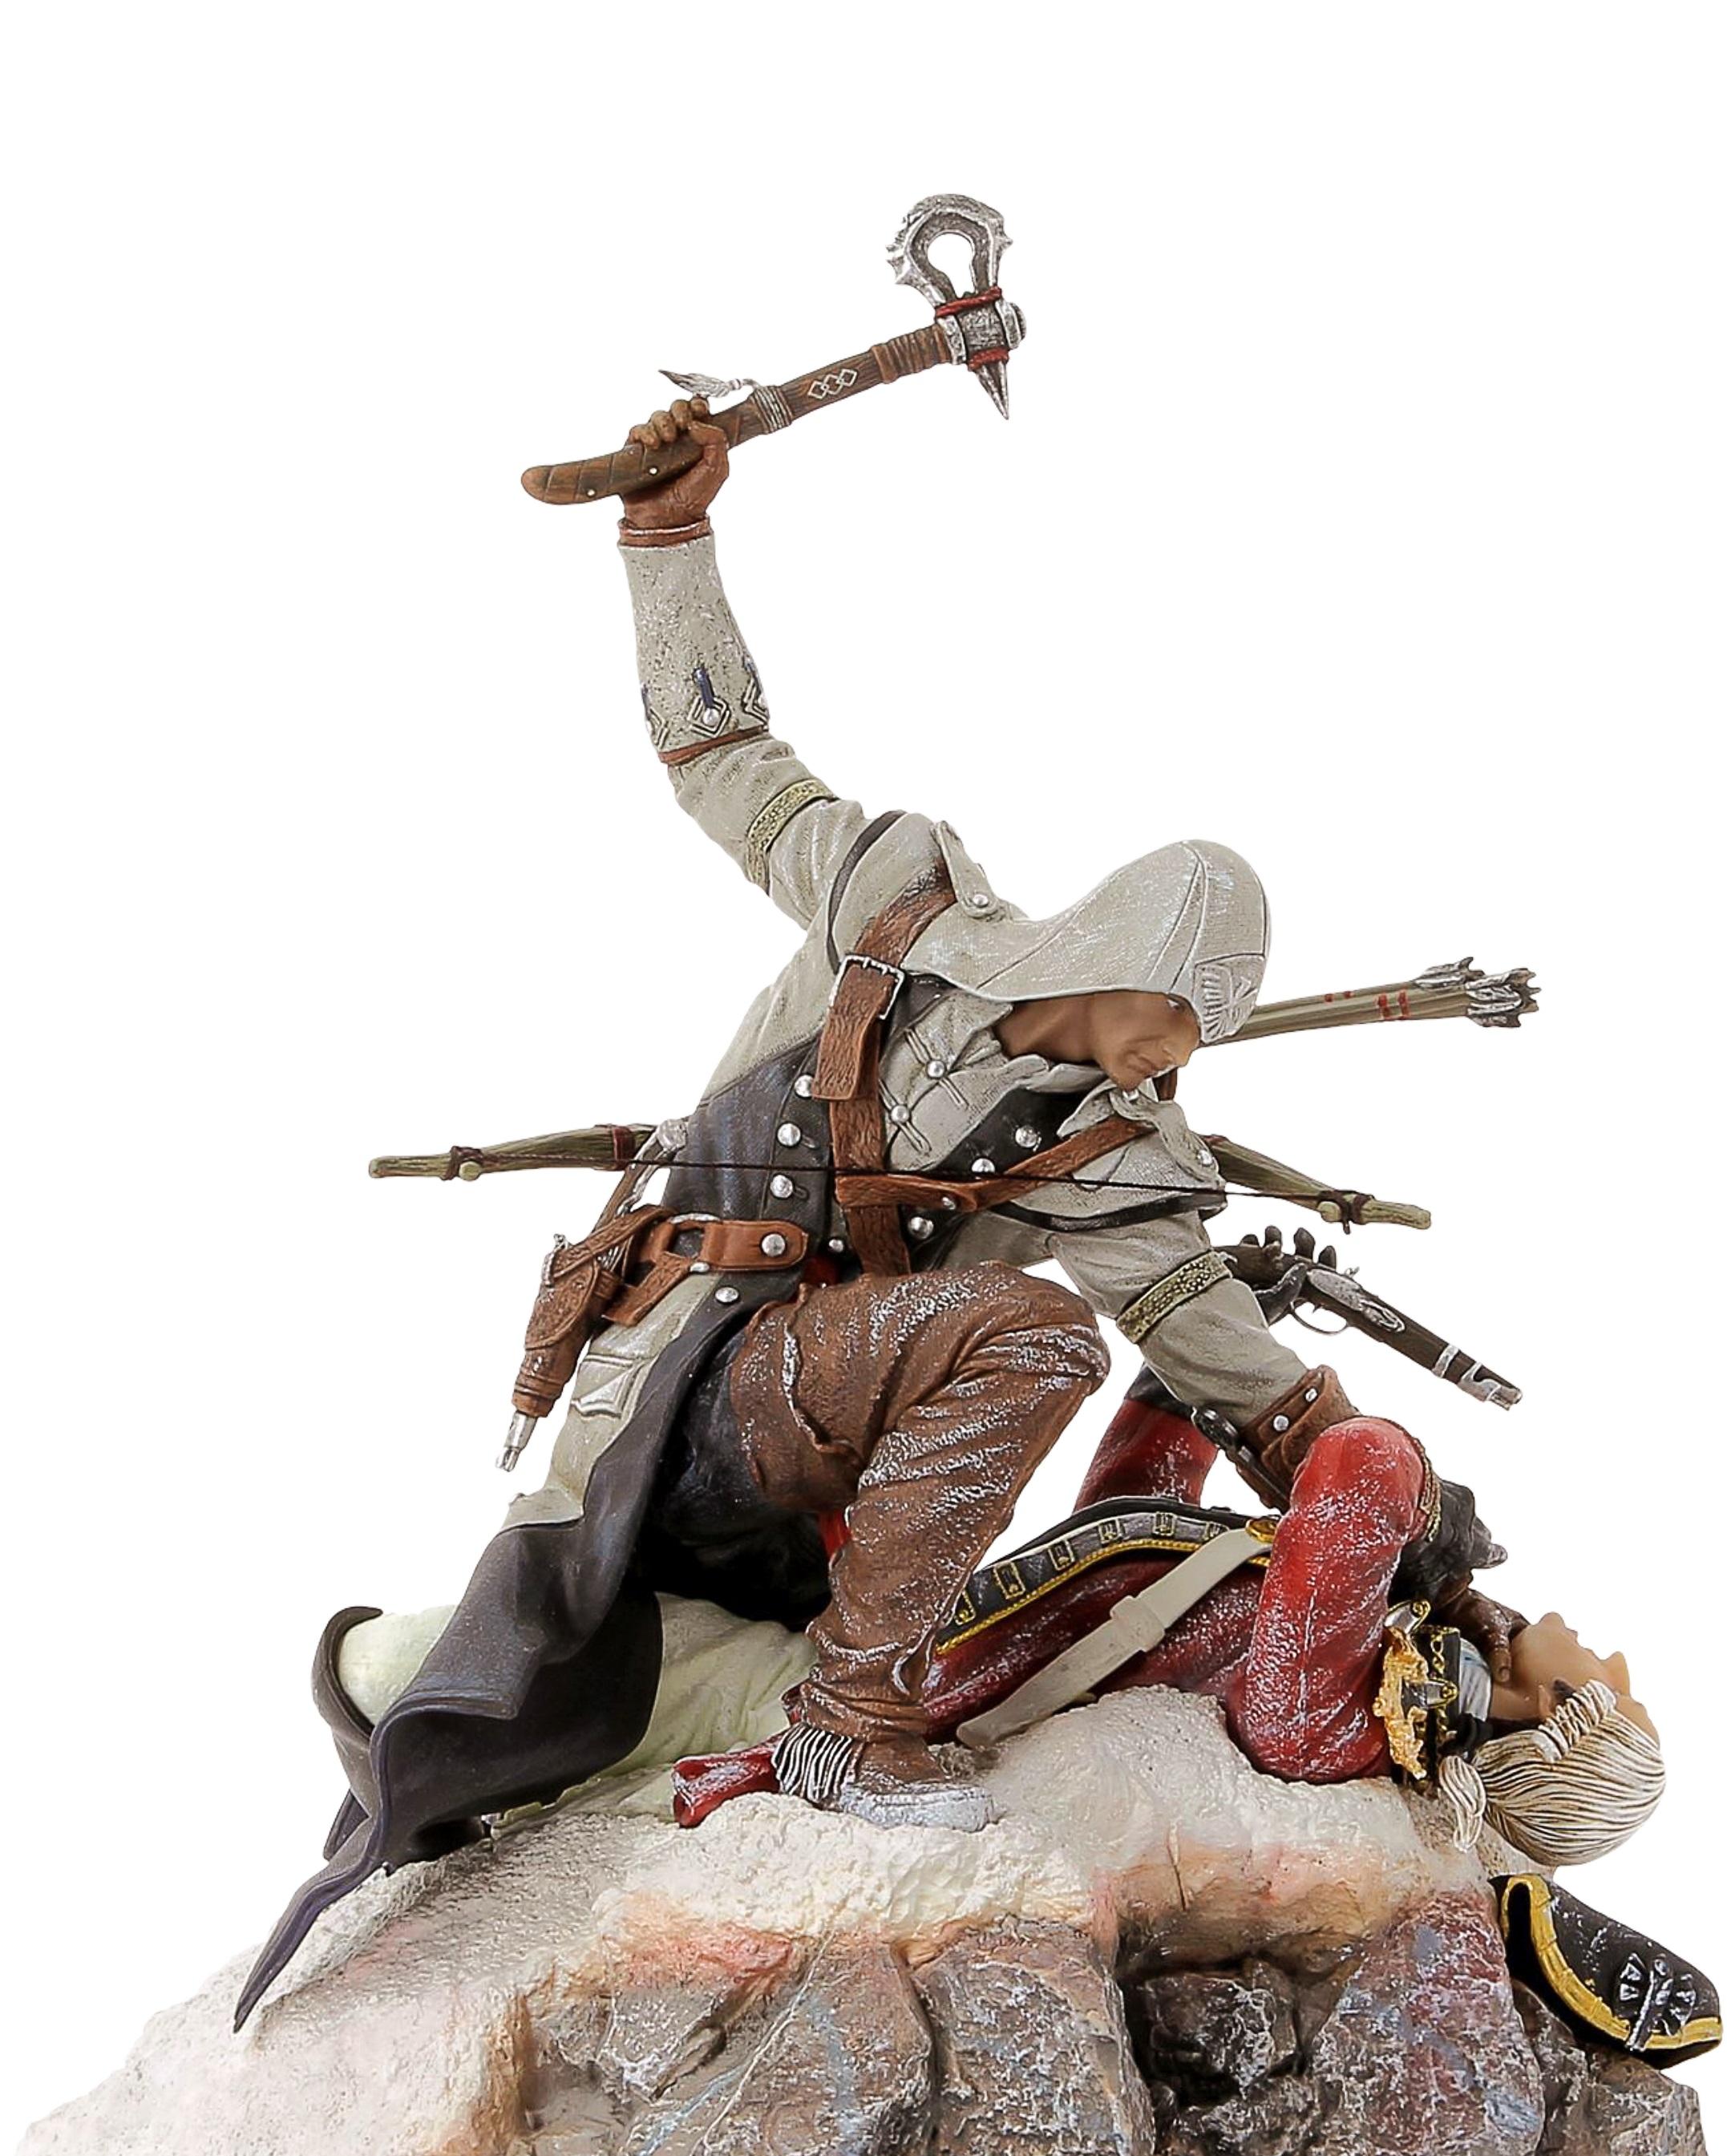 Фигурка Assassins Creed III: Connor – The Last Breath (28 см)Ubicollectibles представляет новинку – фигурку Assassins Creed III: Connor – The Last Breath  – воссоздание сцены из захватывающего трейлера-анонса Assassins Creed III.<br>